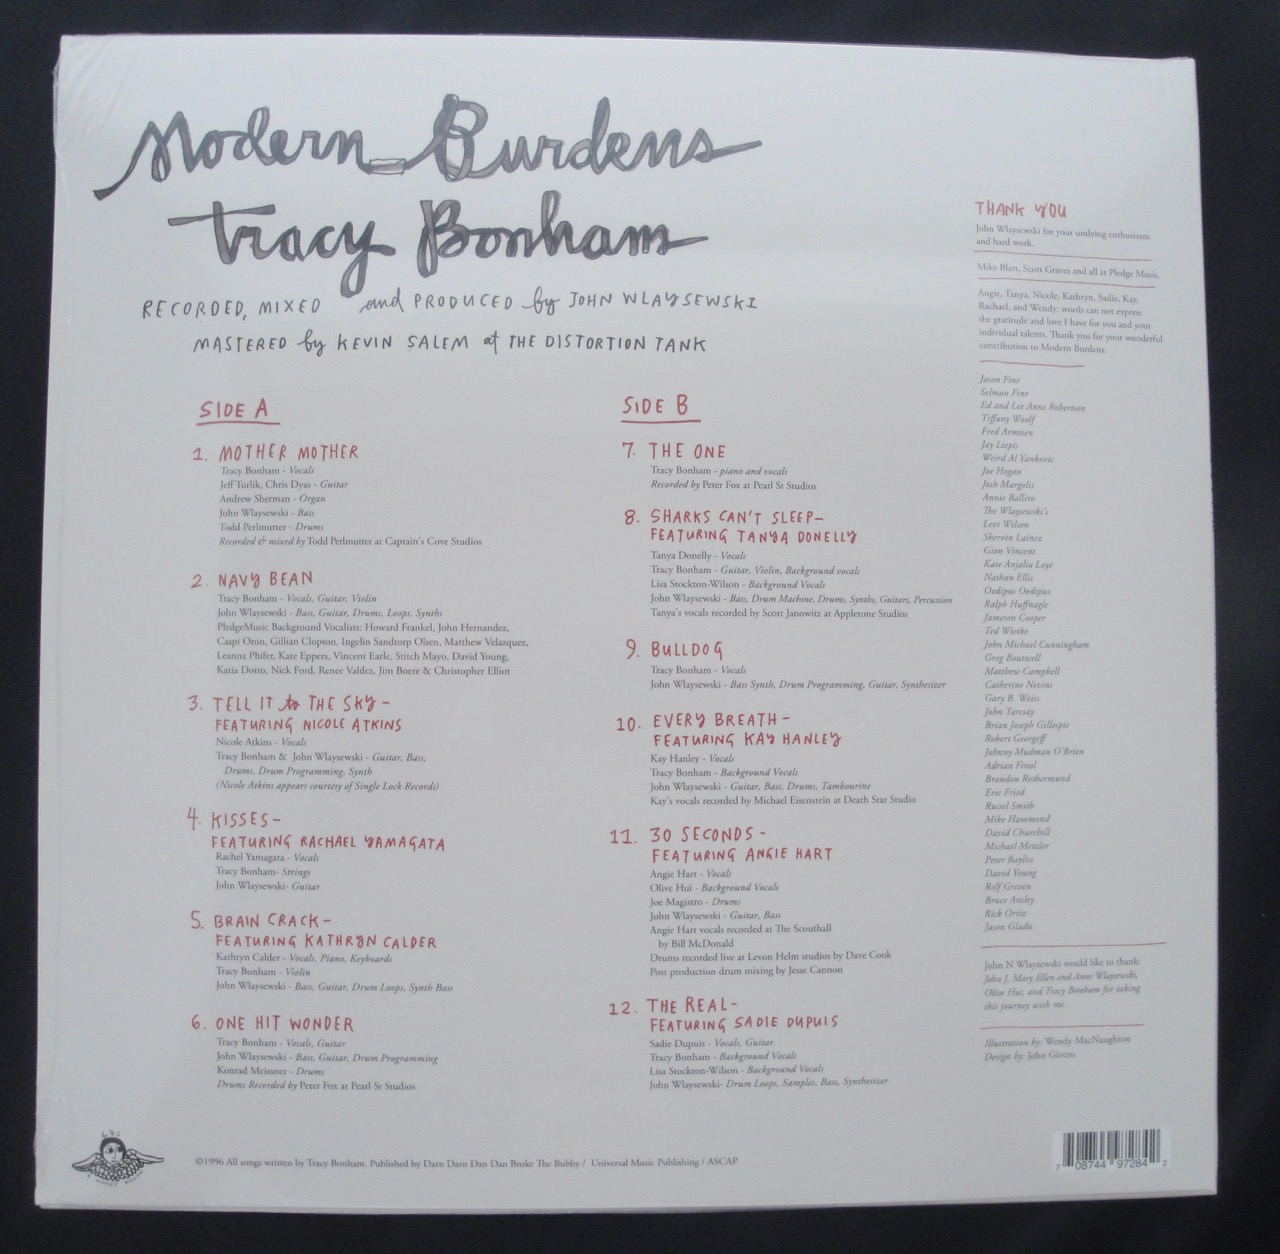 Tracy Bonham - Modern Burdens - Vinyl, LP, Second Motion, 2017